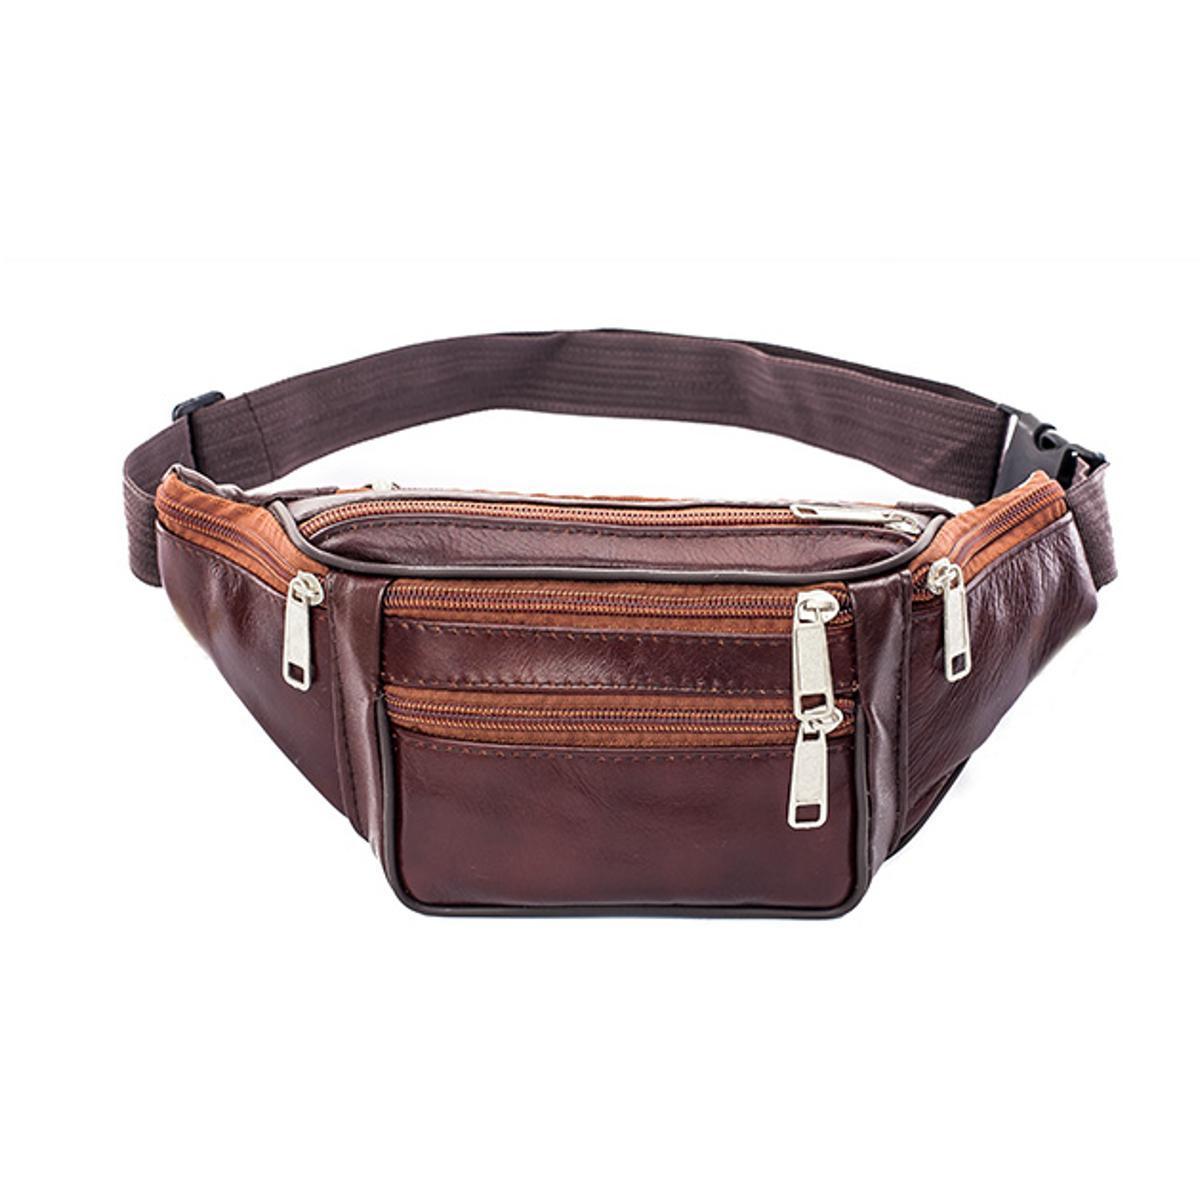 f56f4c574934 Waterproof Waist Fanny Pack Belt Bag Pouch Travel Sport Hip Purse Men Women  Black/Yellow,/Khaki/Coffee/Brown